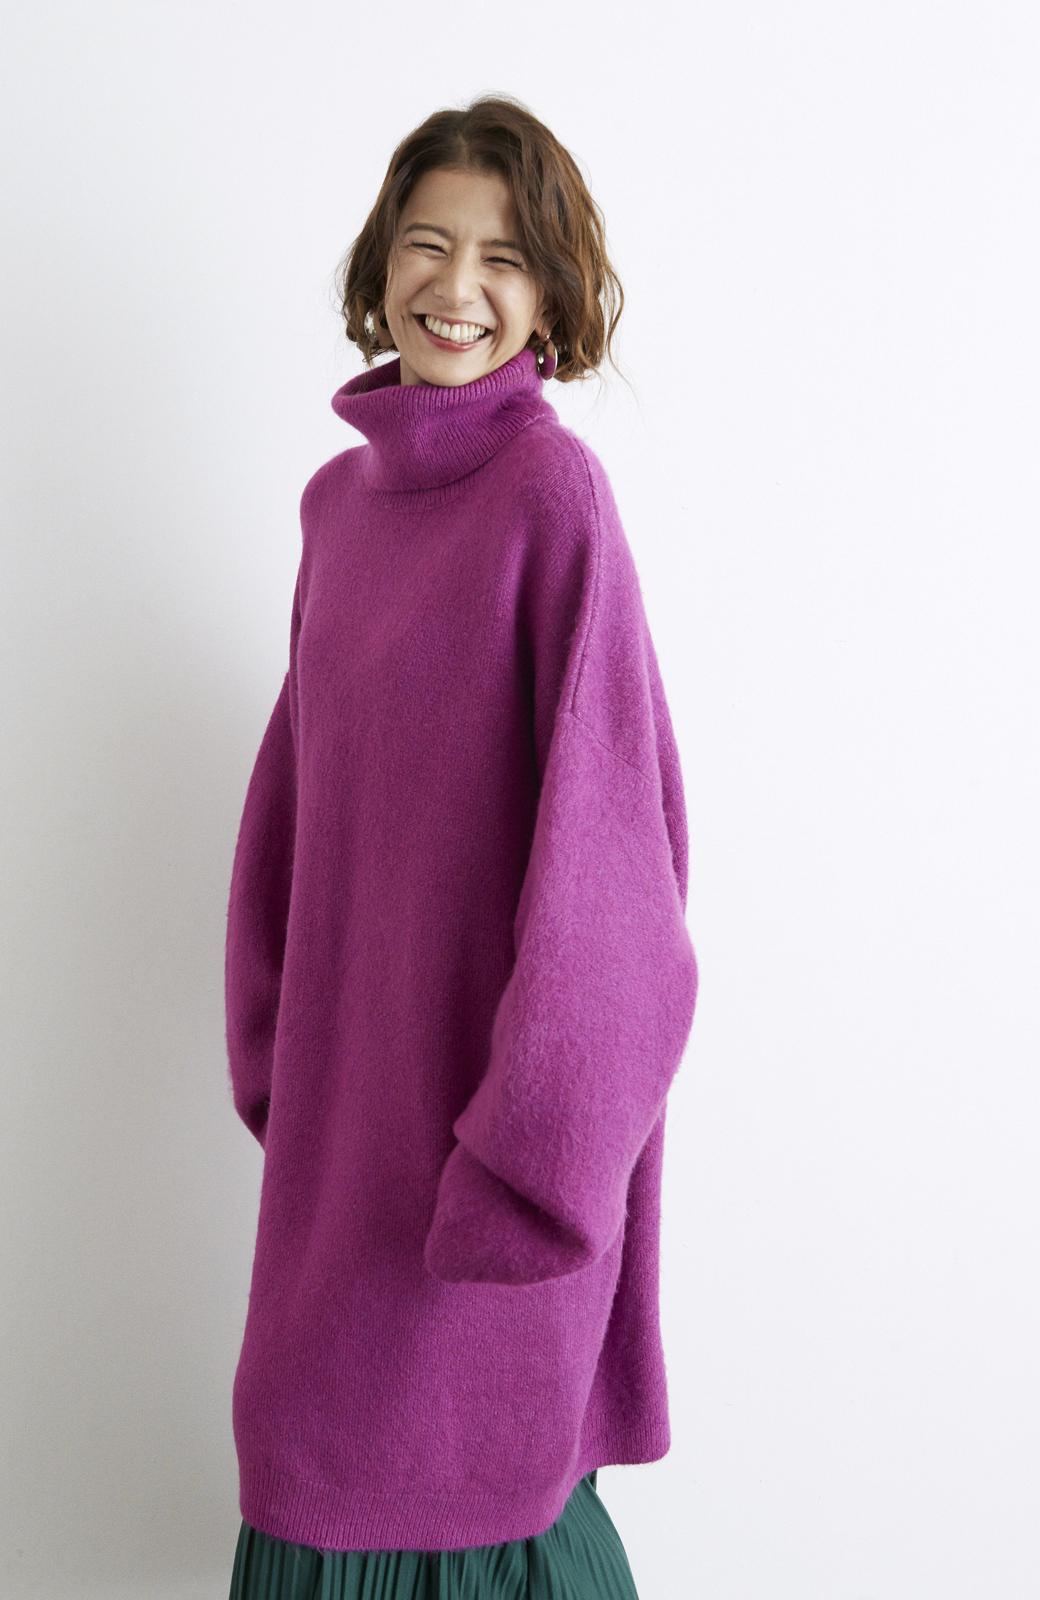 haco! <スザンヌさんコラボ>ラブ&ピースプロジェクト ニットワンピ&チュール刺しゅうスカートセット <パープル系その他>の商品写真13